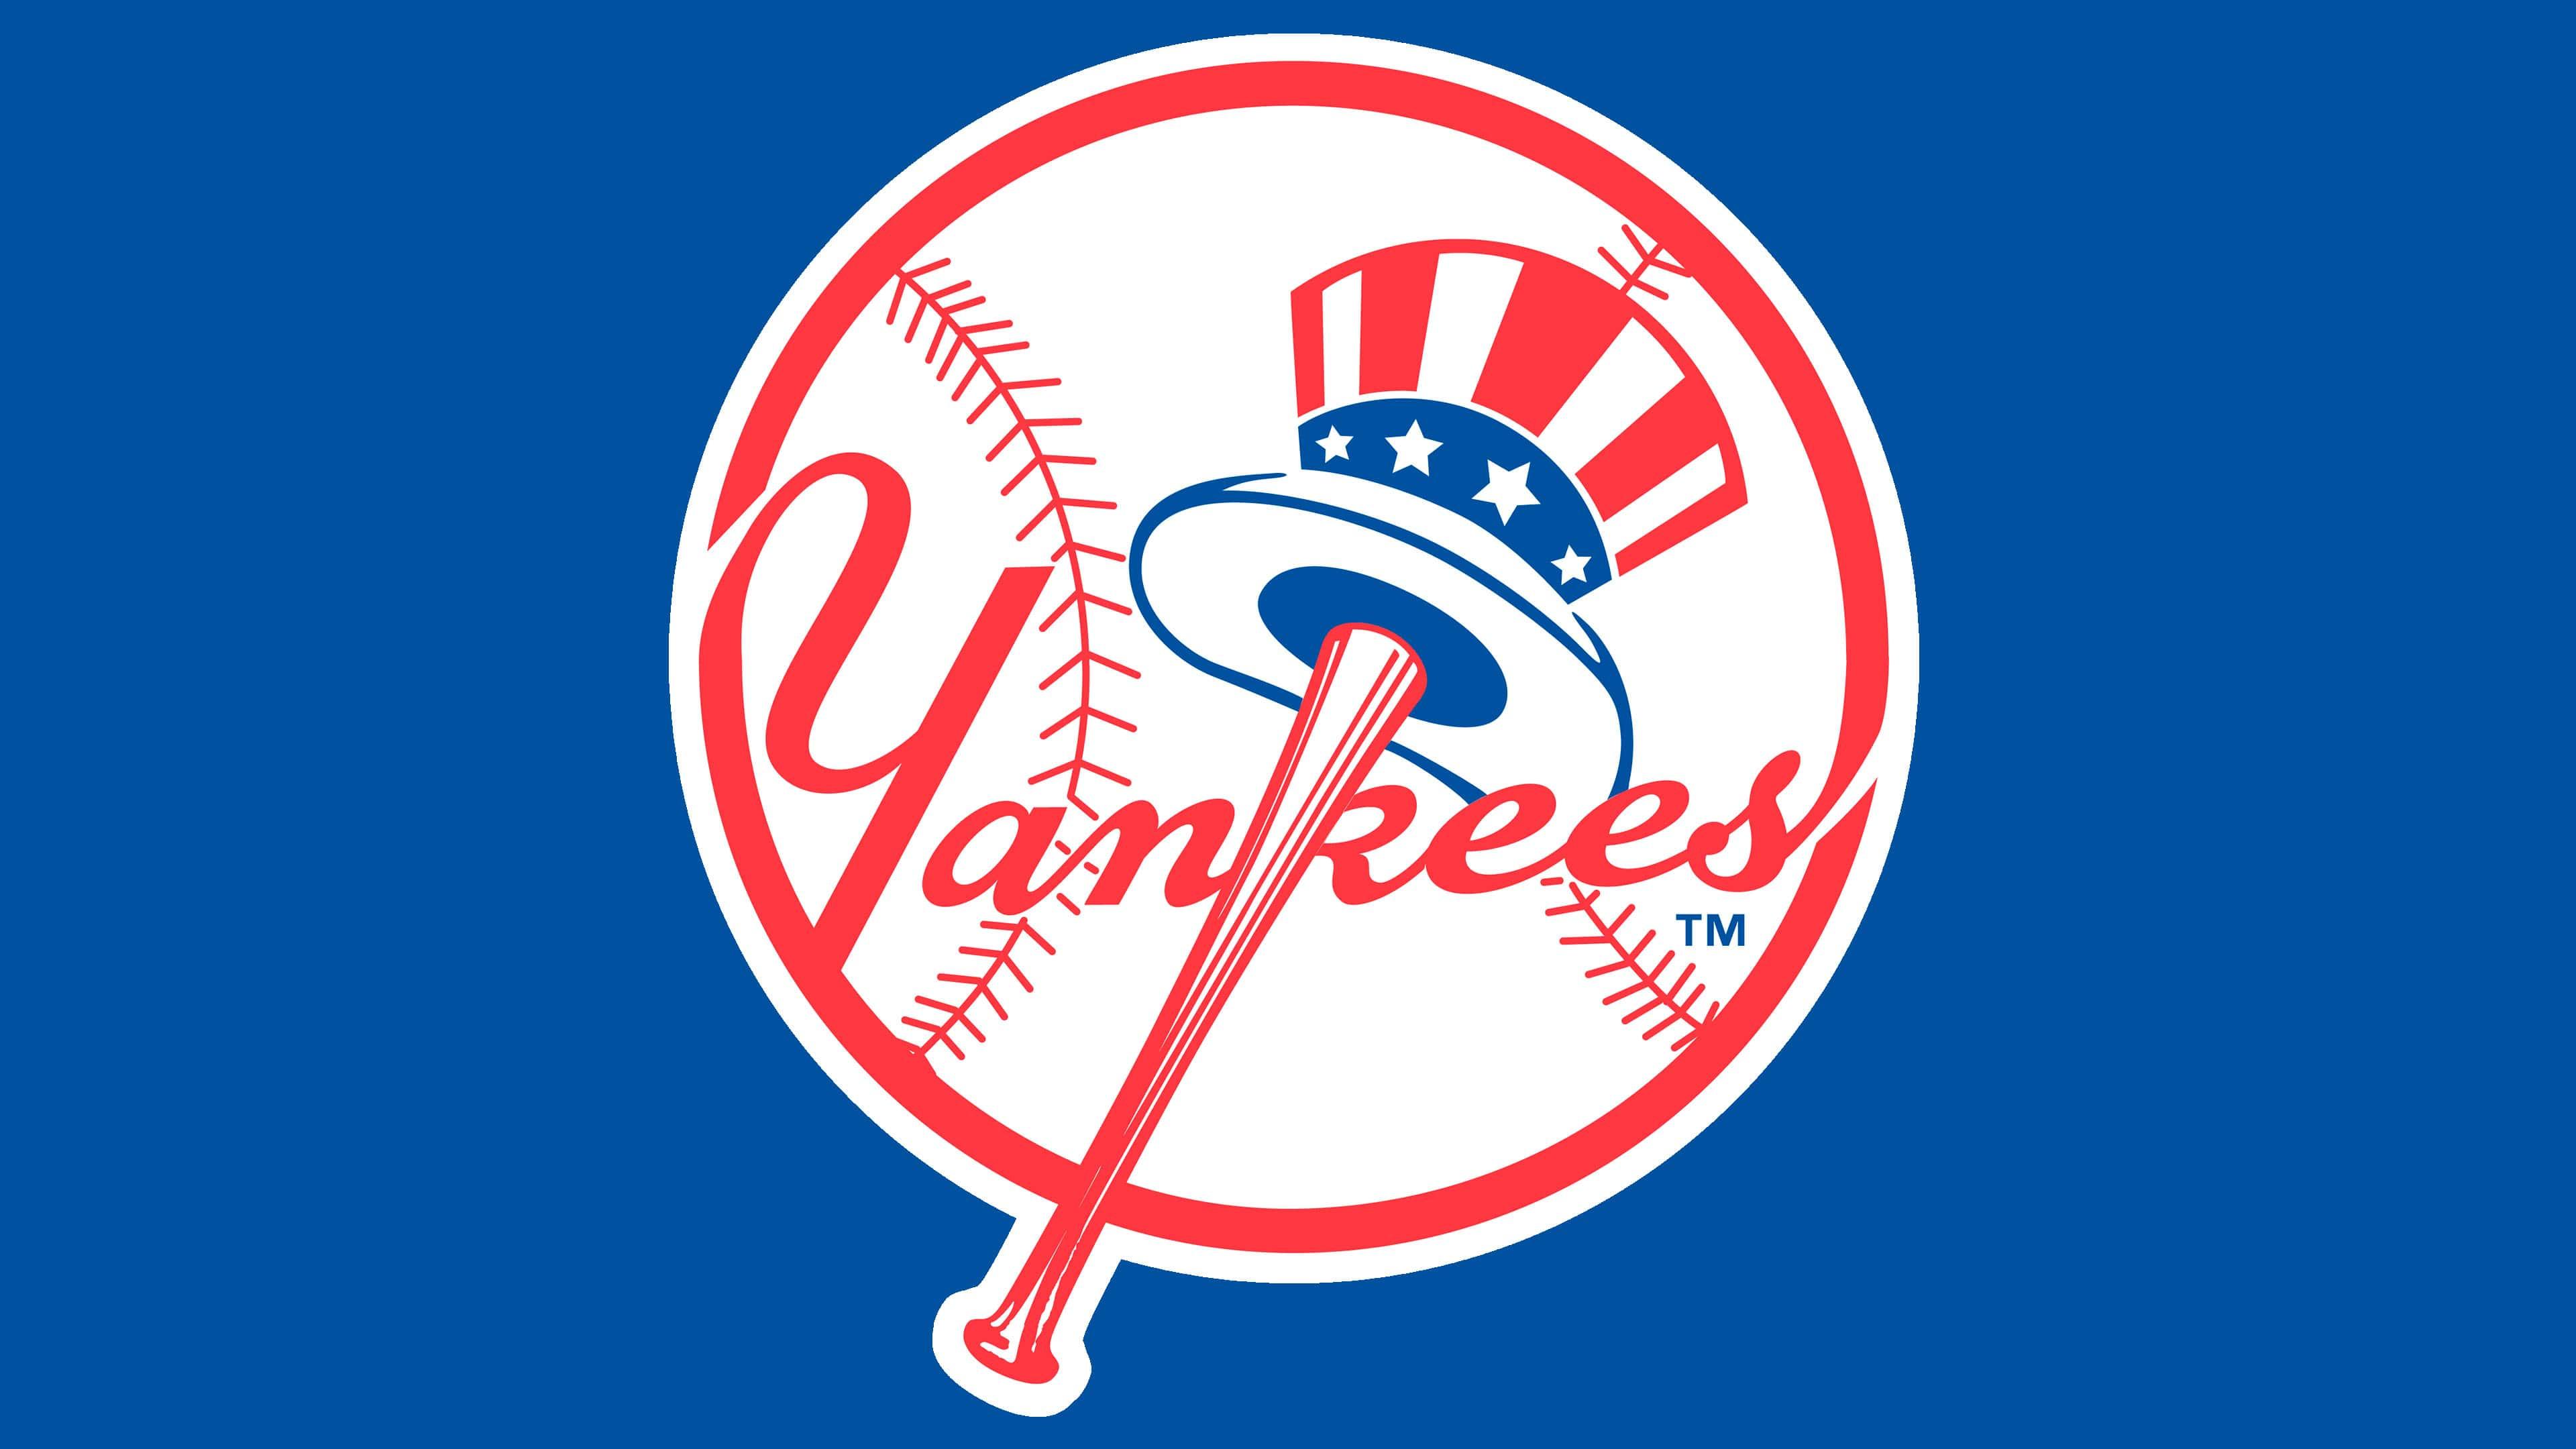 New York Yankees Logos.